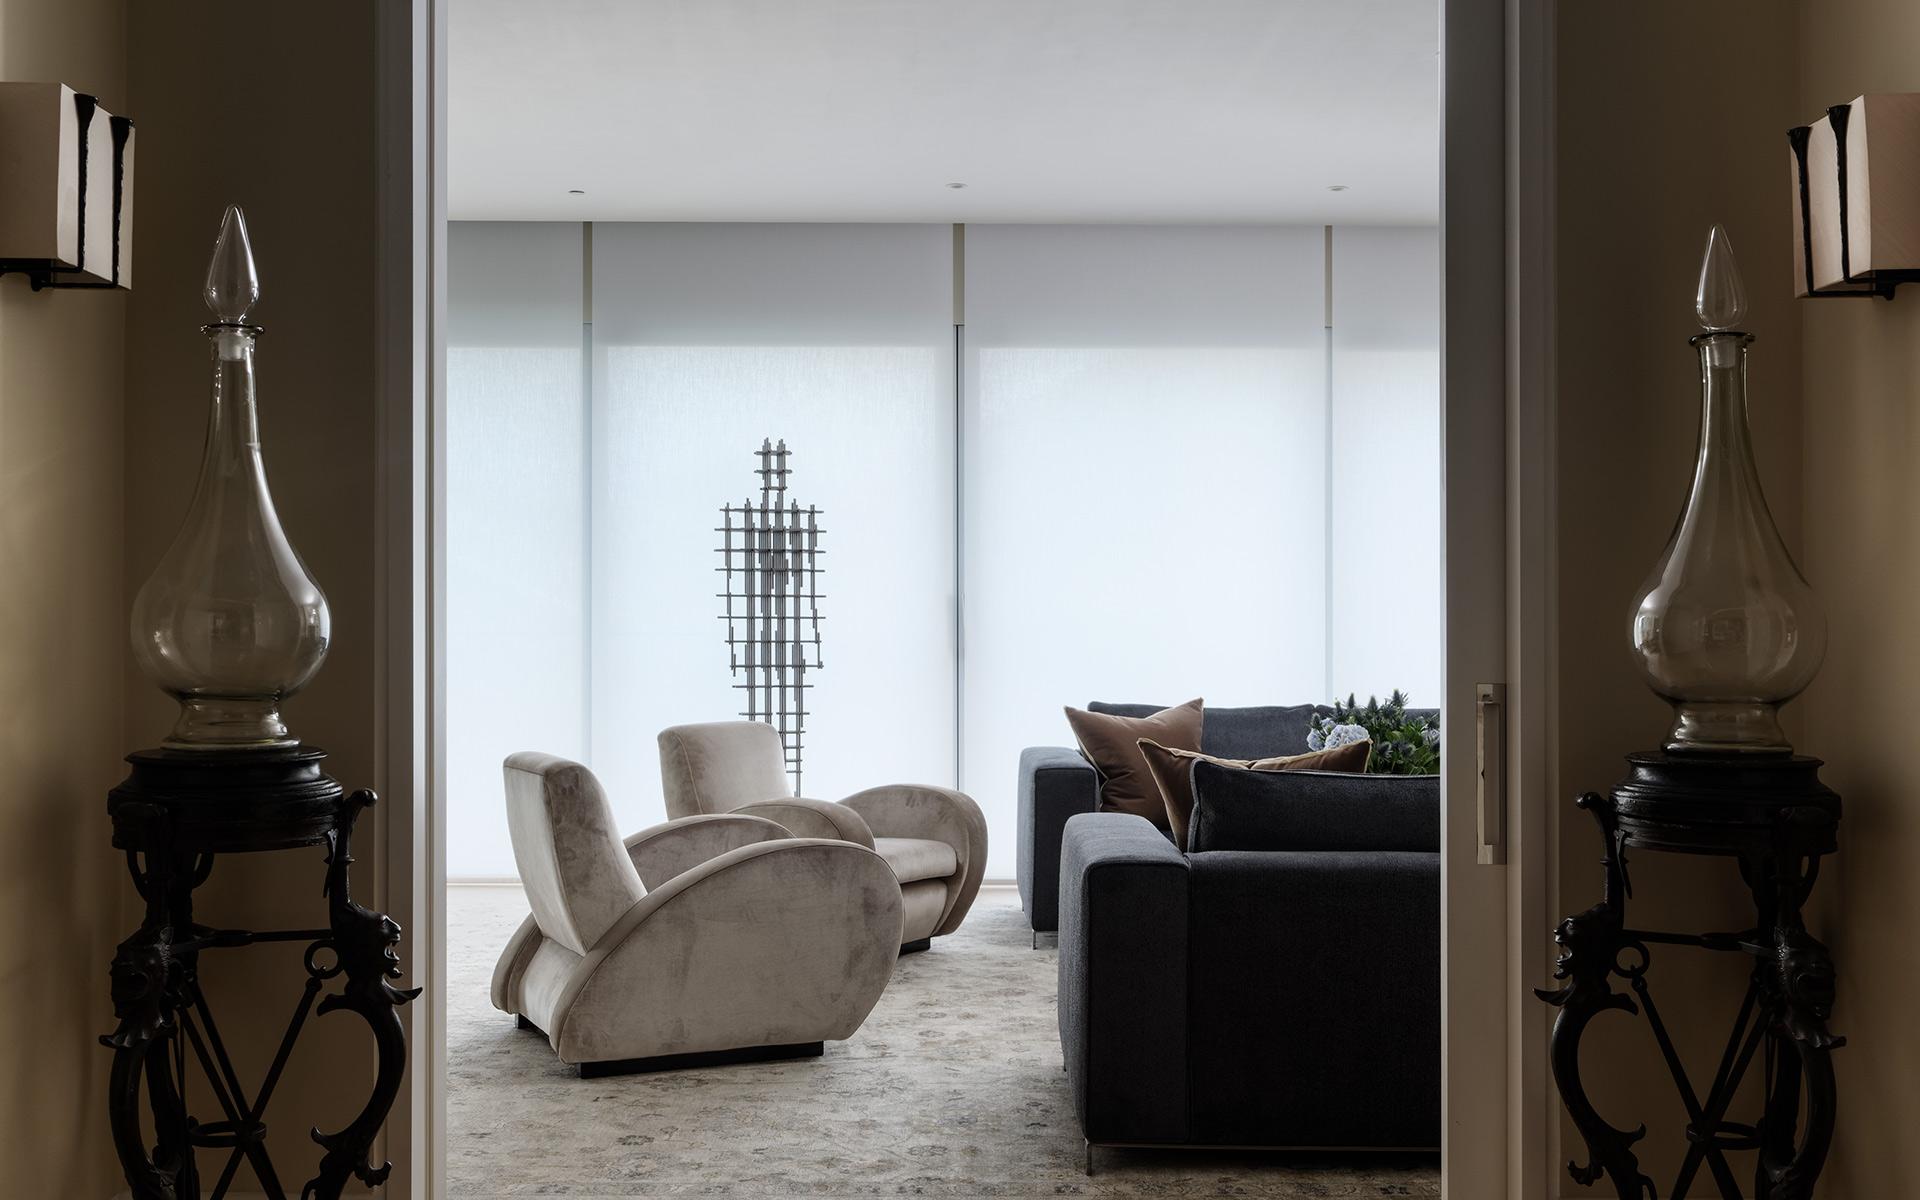 Luxury apartment interior design by Corbie Phillips